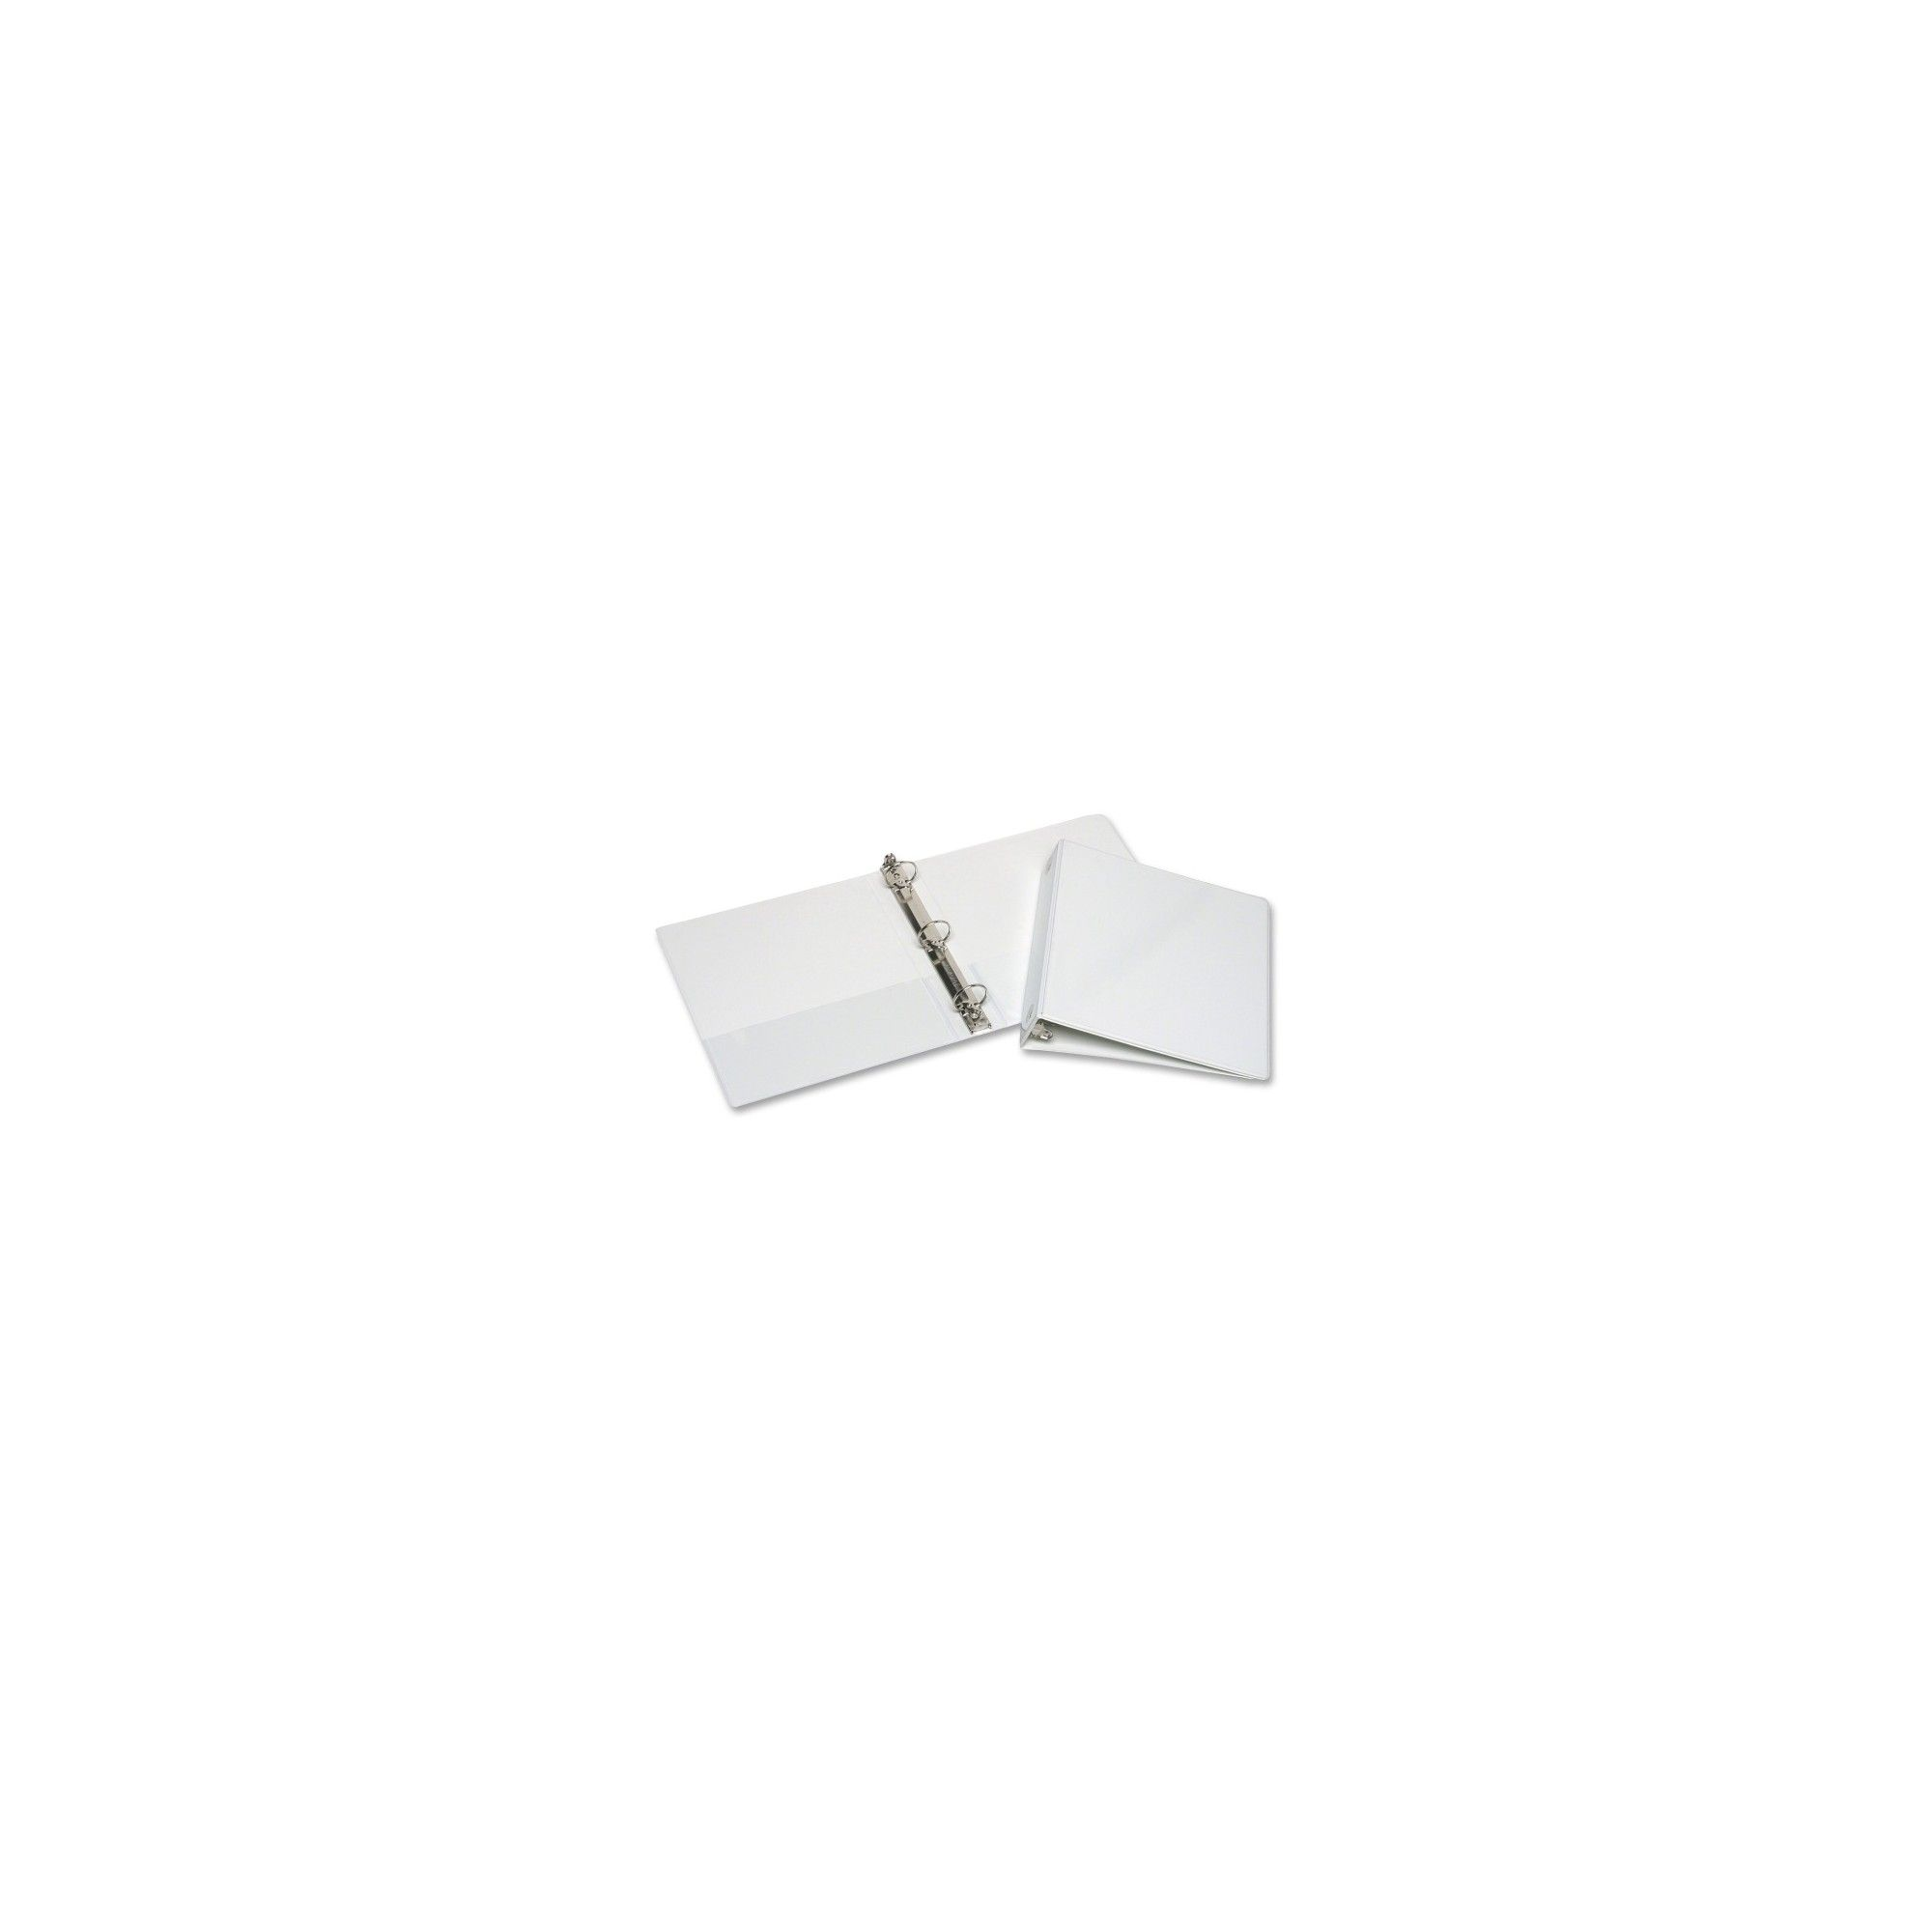 Skilcraft 3 Ring View Binders With Pocket White Sheet Sizes Binder Rings